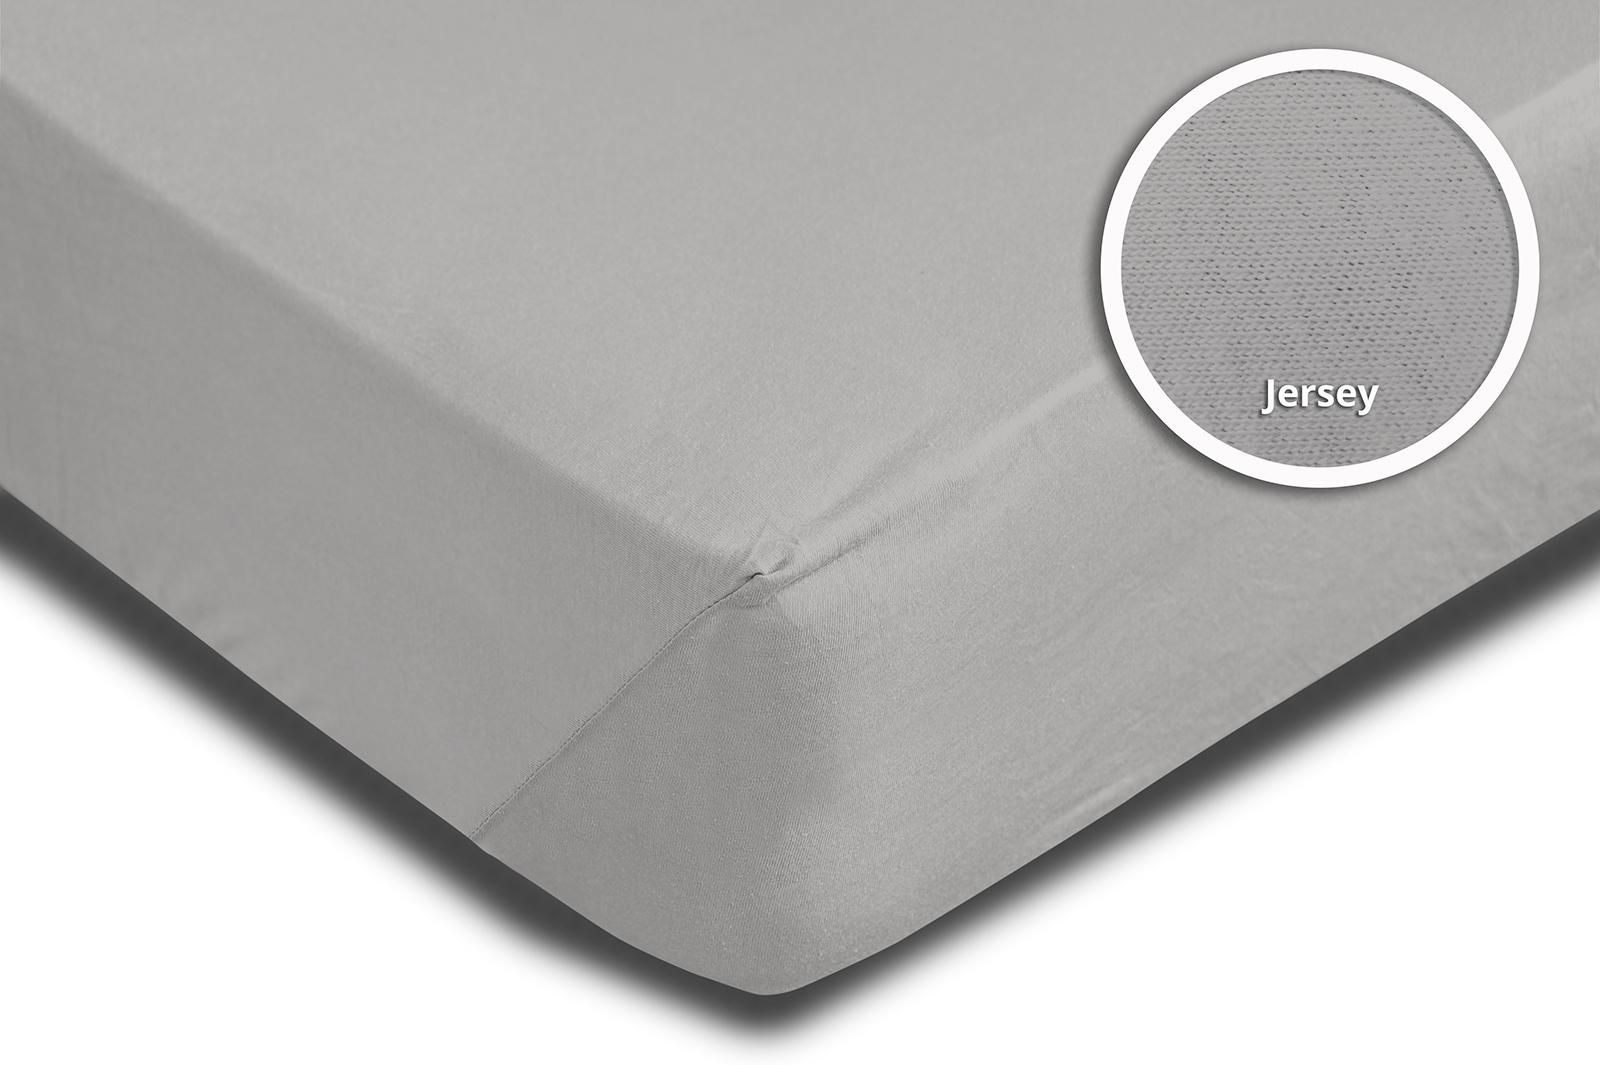 2 topper spannbettlaken silber 140x200 cm 160x200 cm jersey baumwolle set ebay. Black Bedroom Furniture Sets. Home Design Ideas